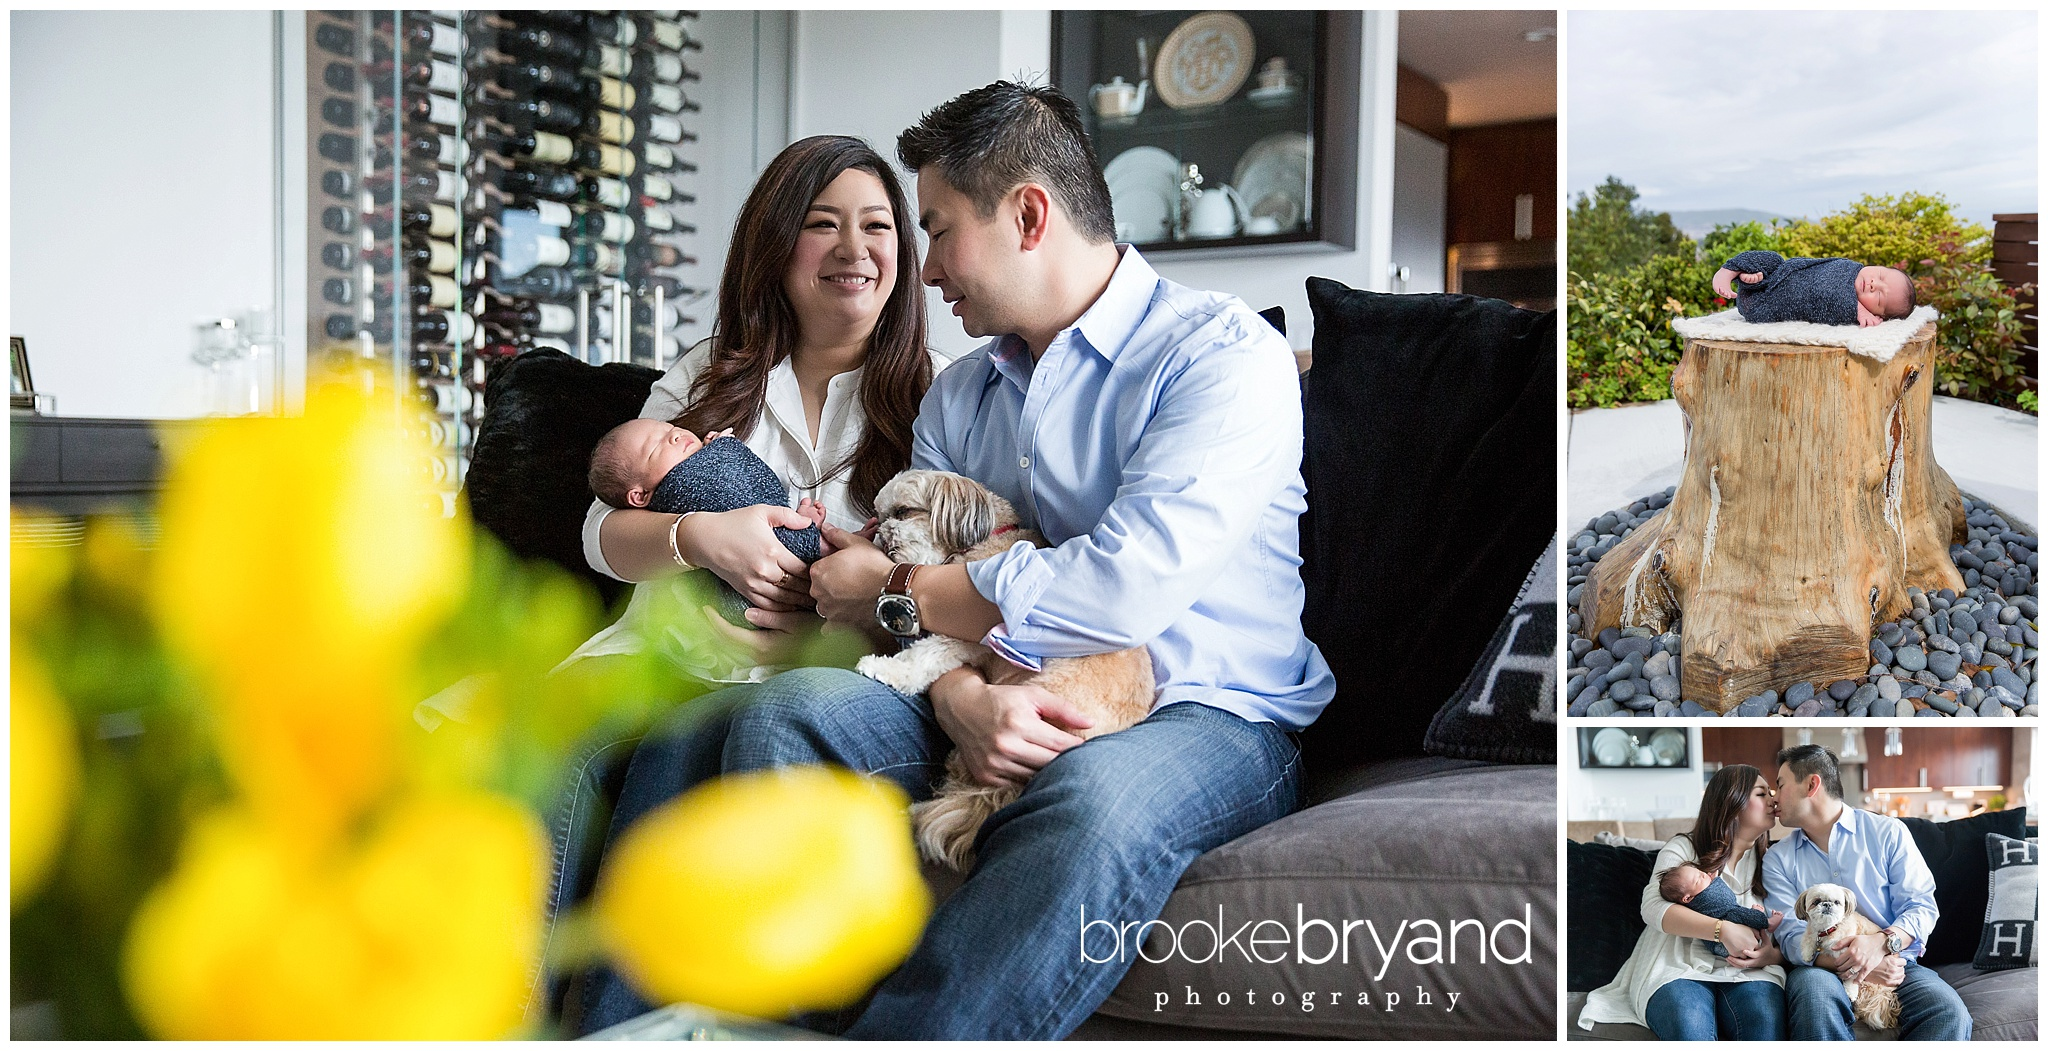 04.2016-Lum-Raleigh-Newborn-Photographer-Lifestyle-Newborn-Photographer-Brooke-Bryand-Photography-BBP_3196.jpg